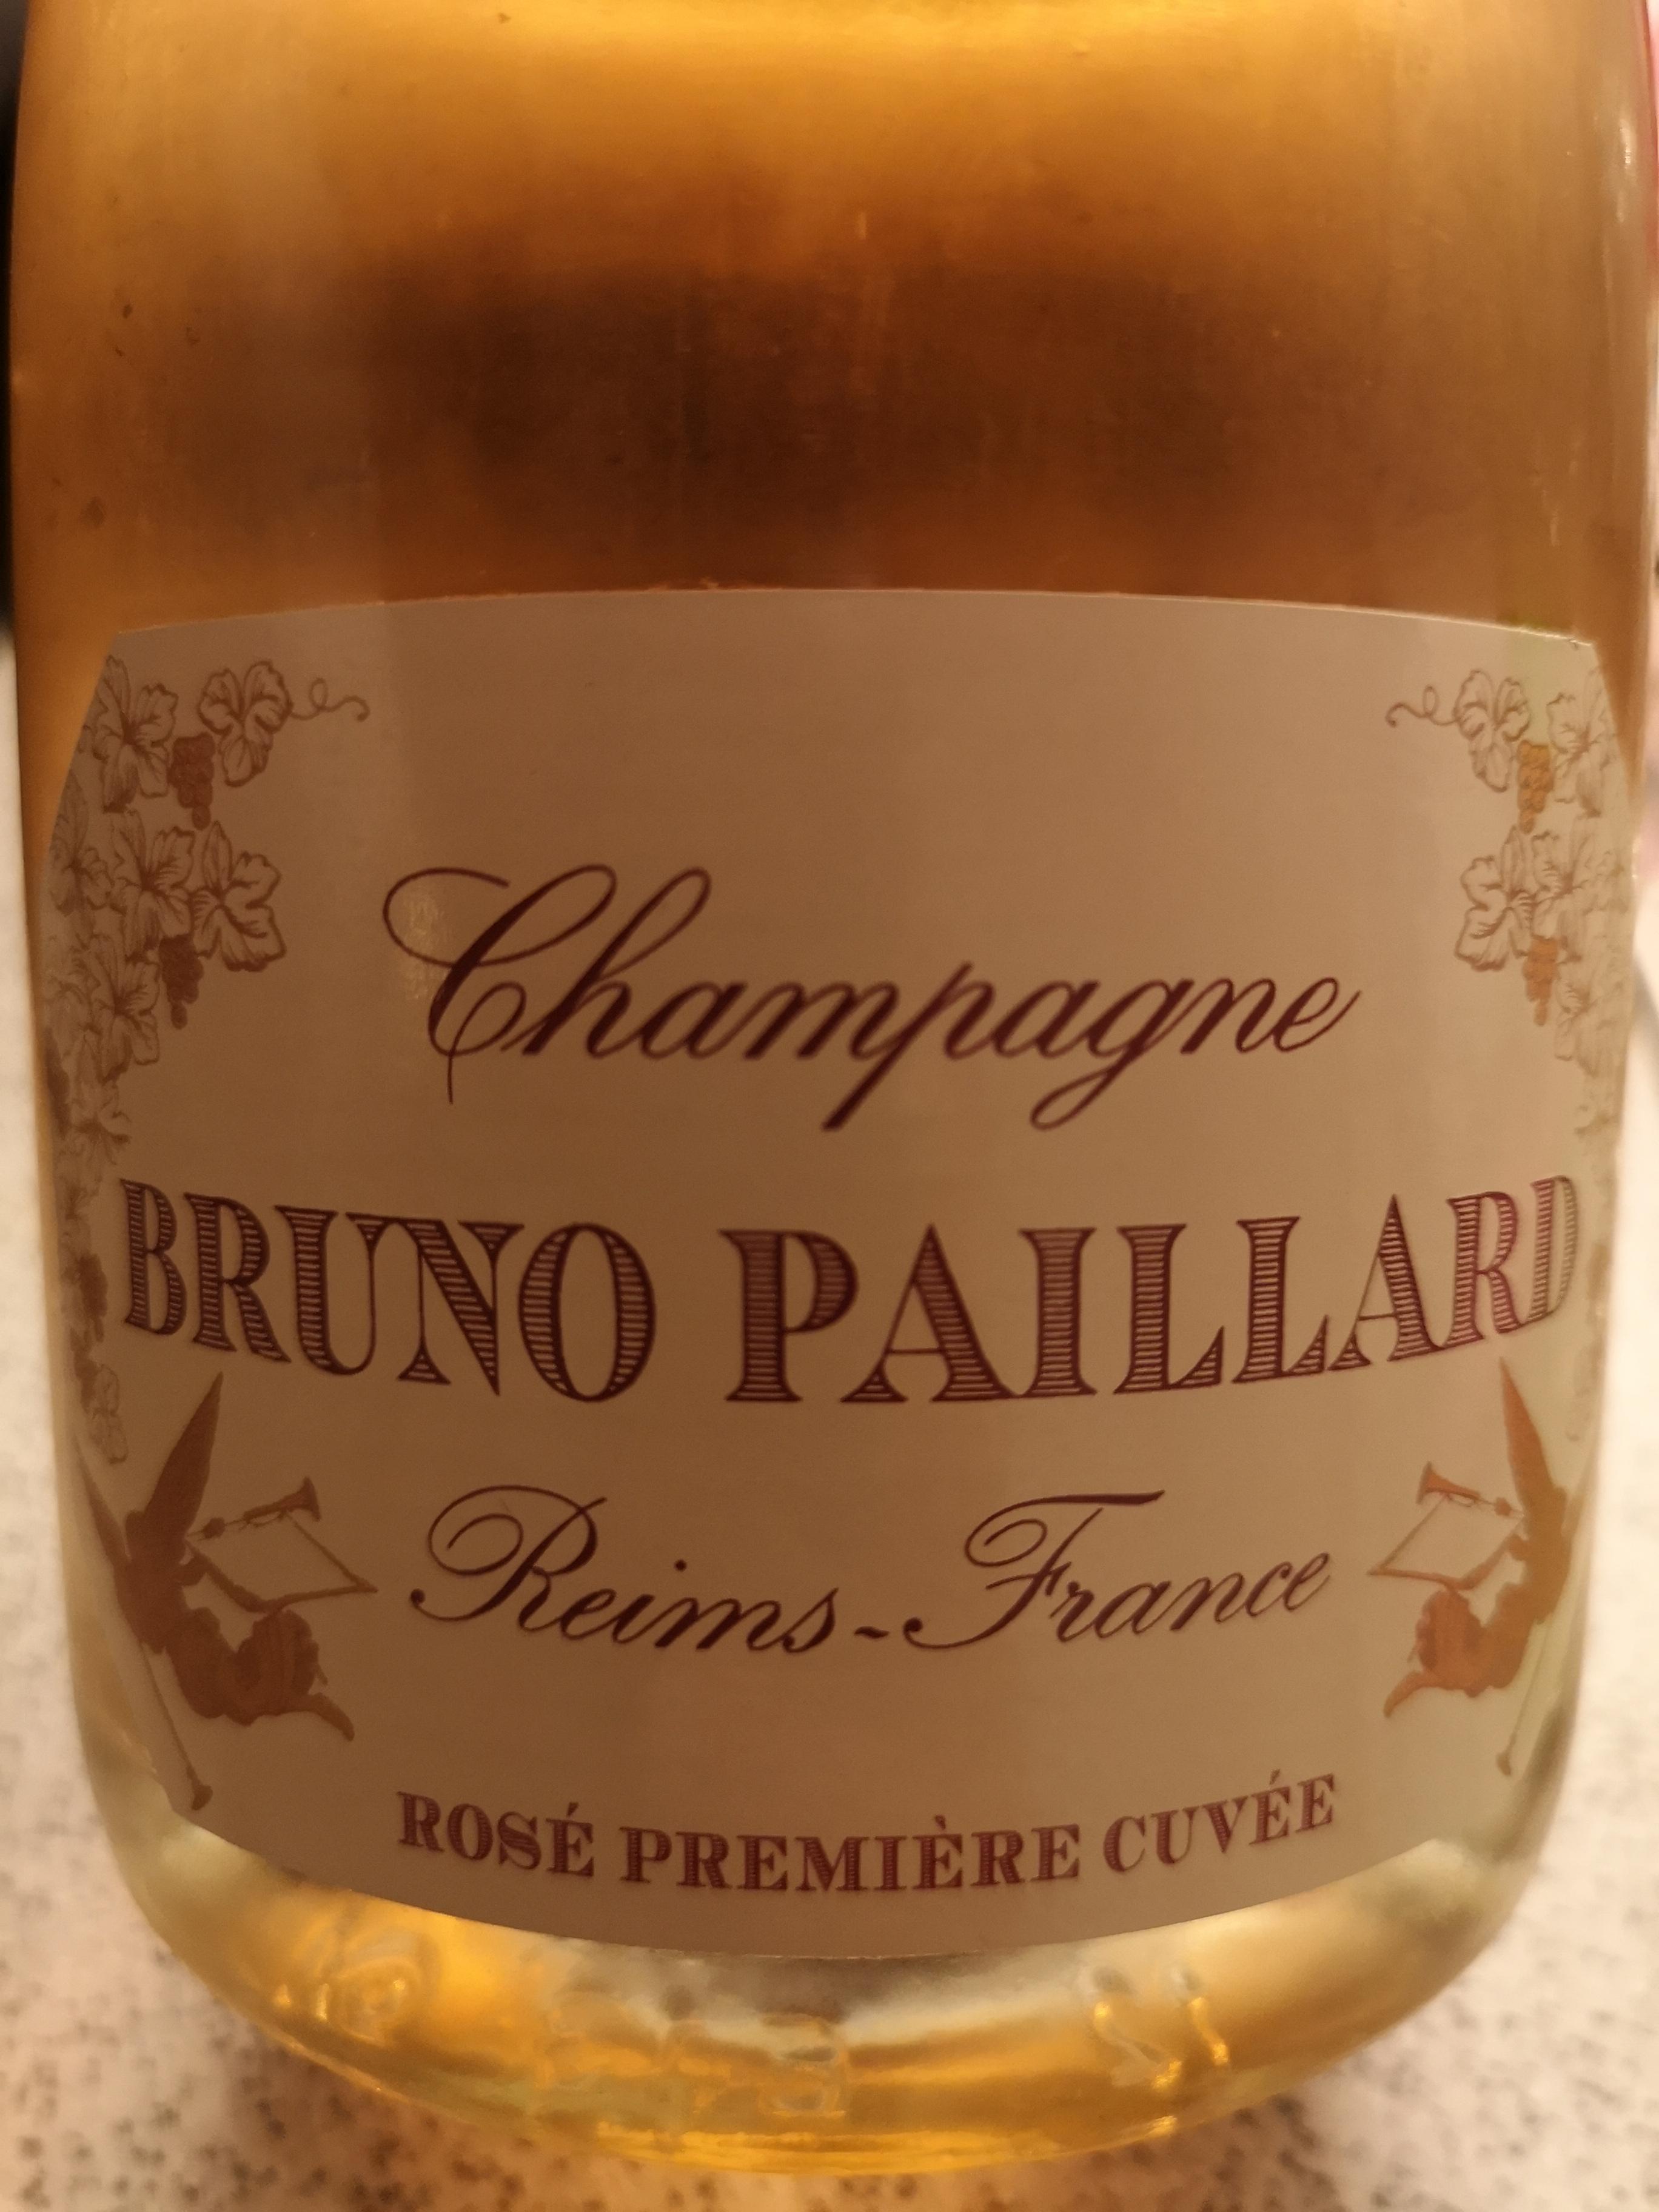 -nv- Champagne Extra Brut Rosé Première Cuvée – Bruno Paillard